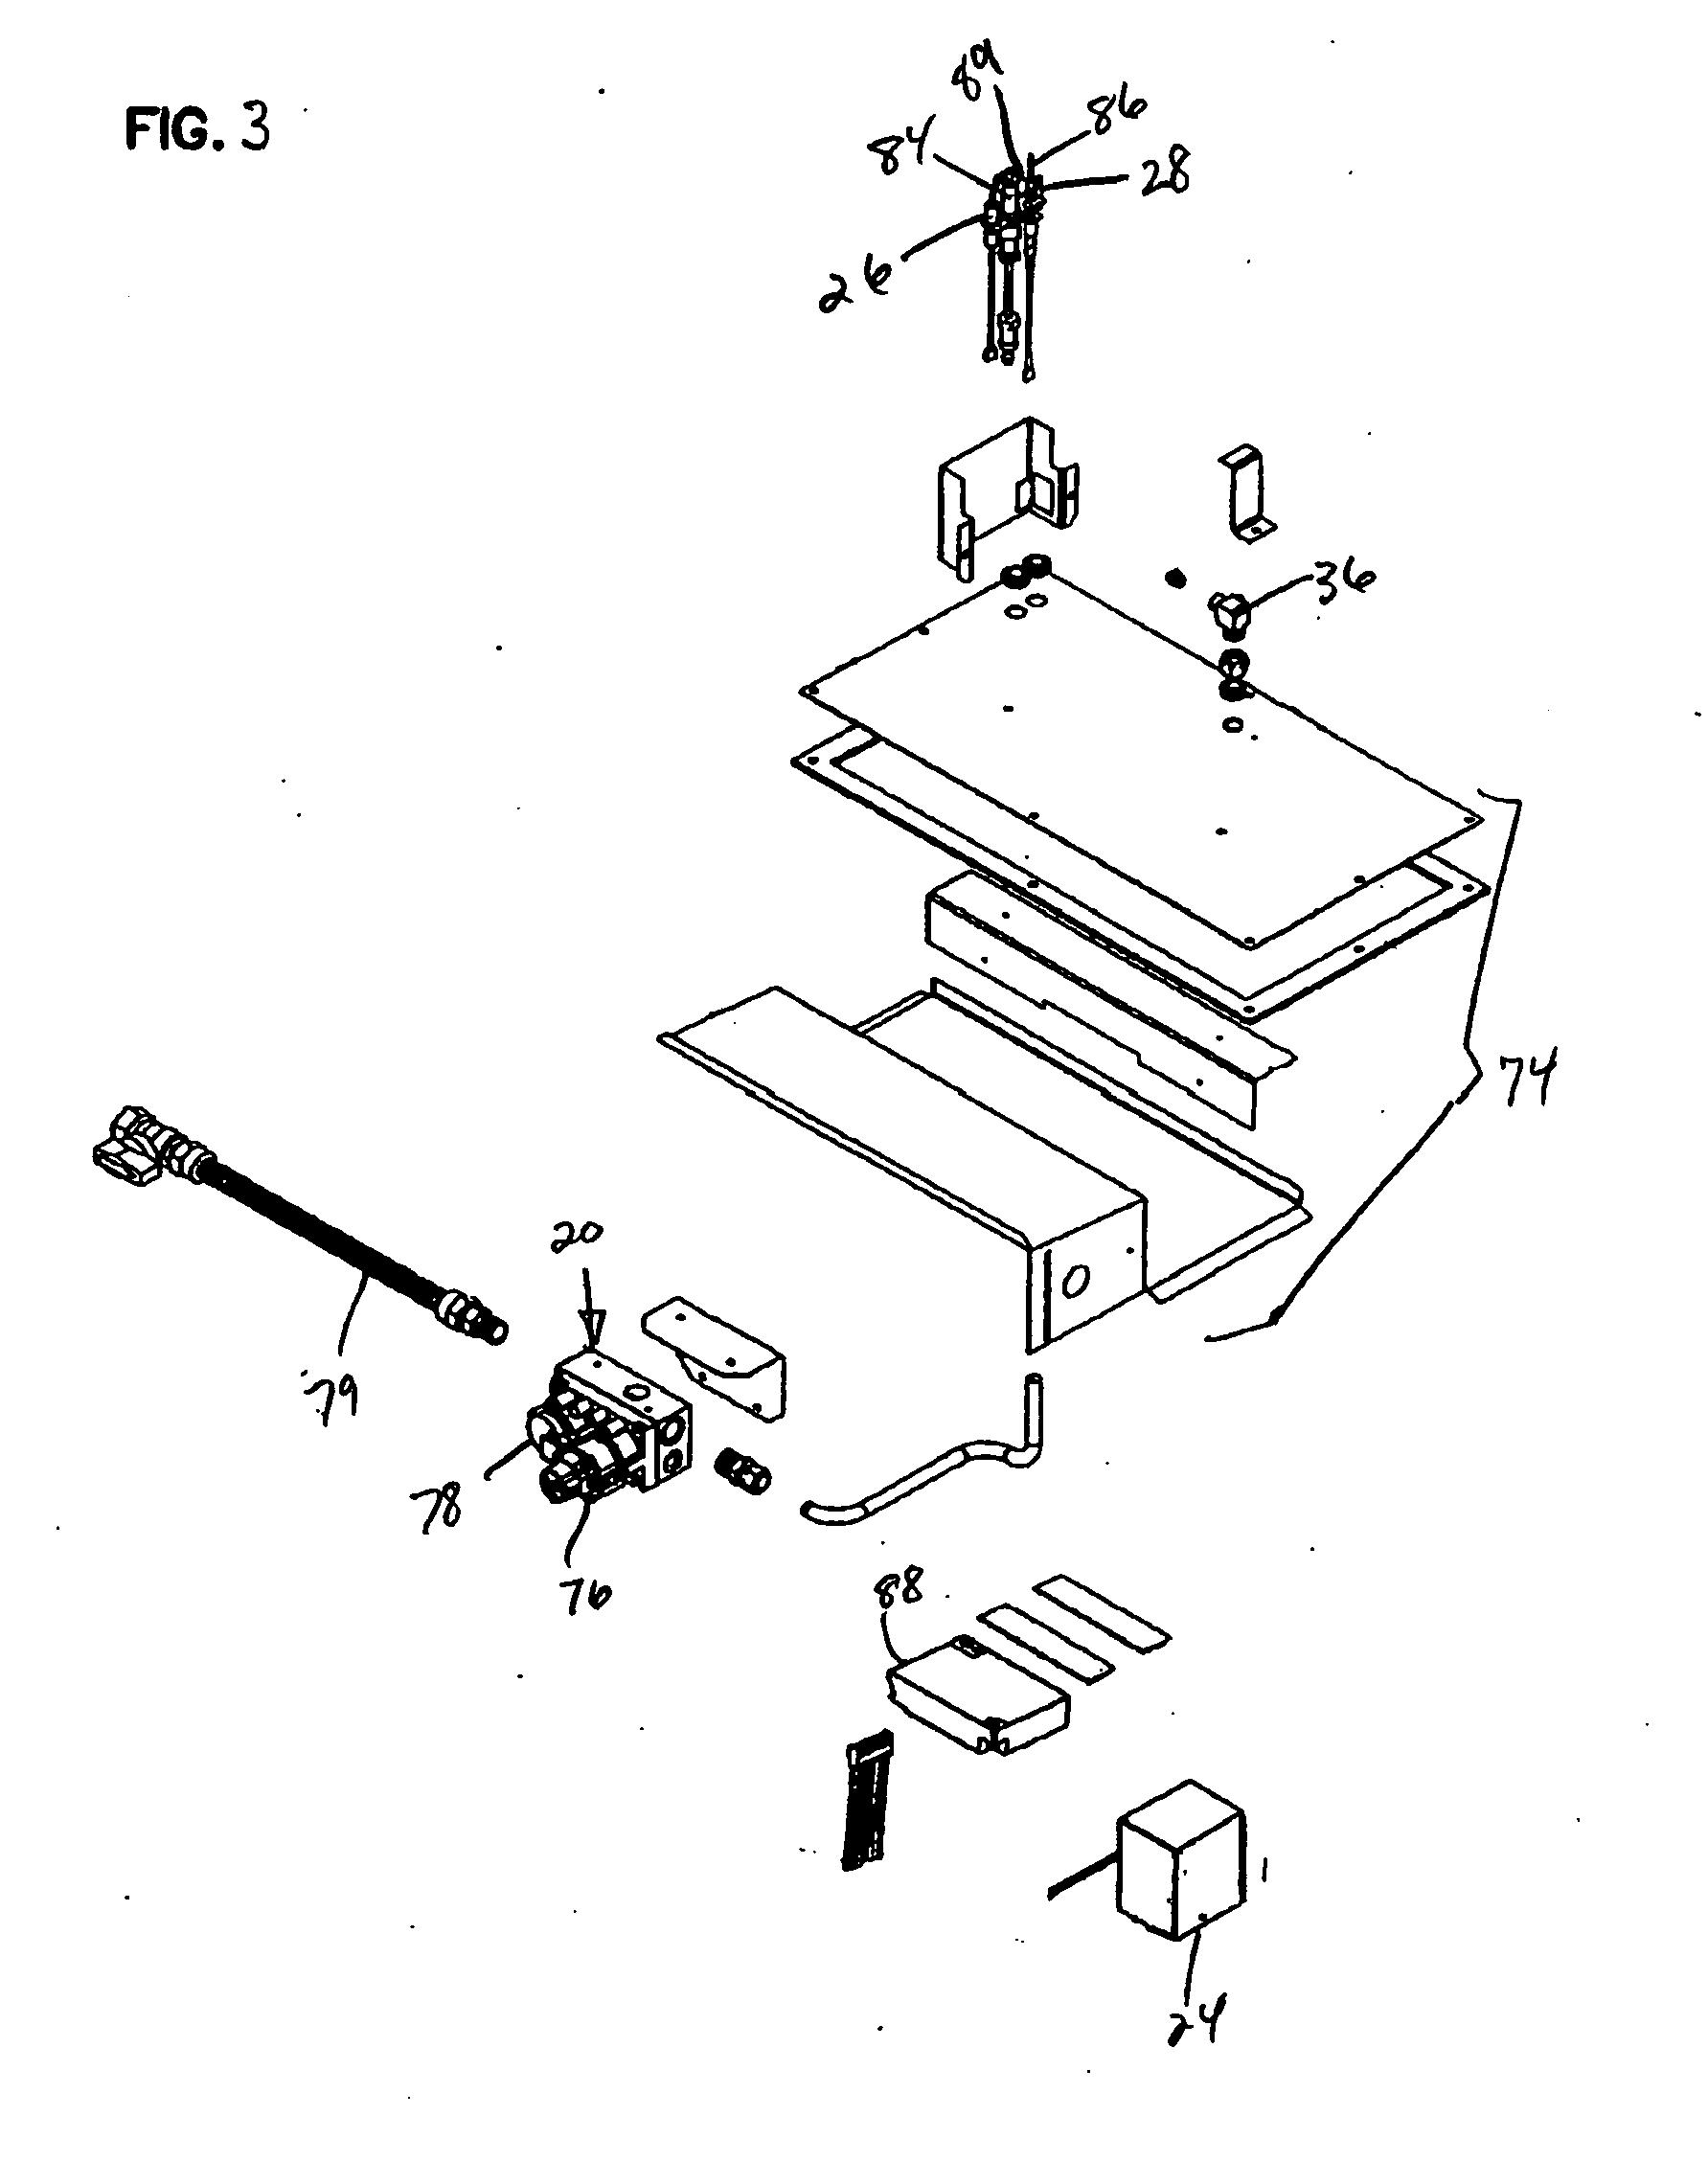 dimmer diagram wiring leviton 0l3701